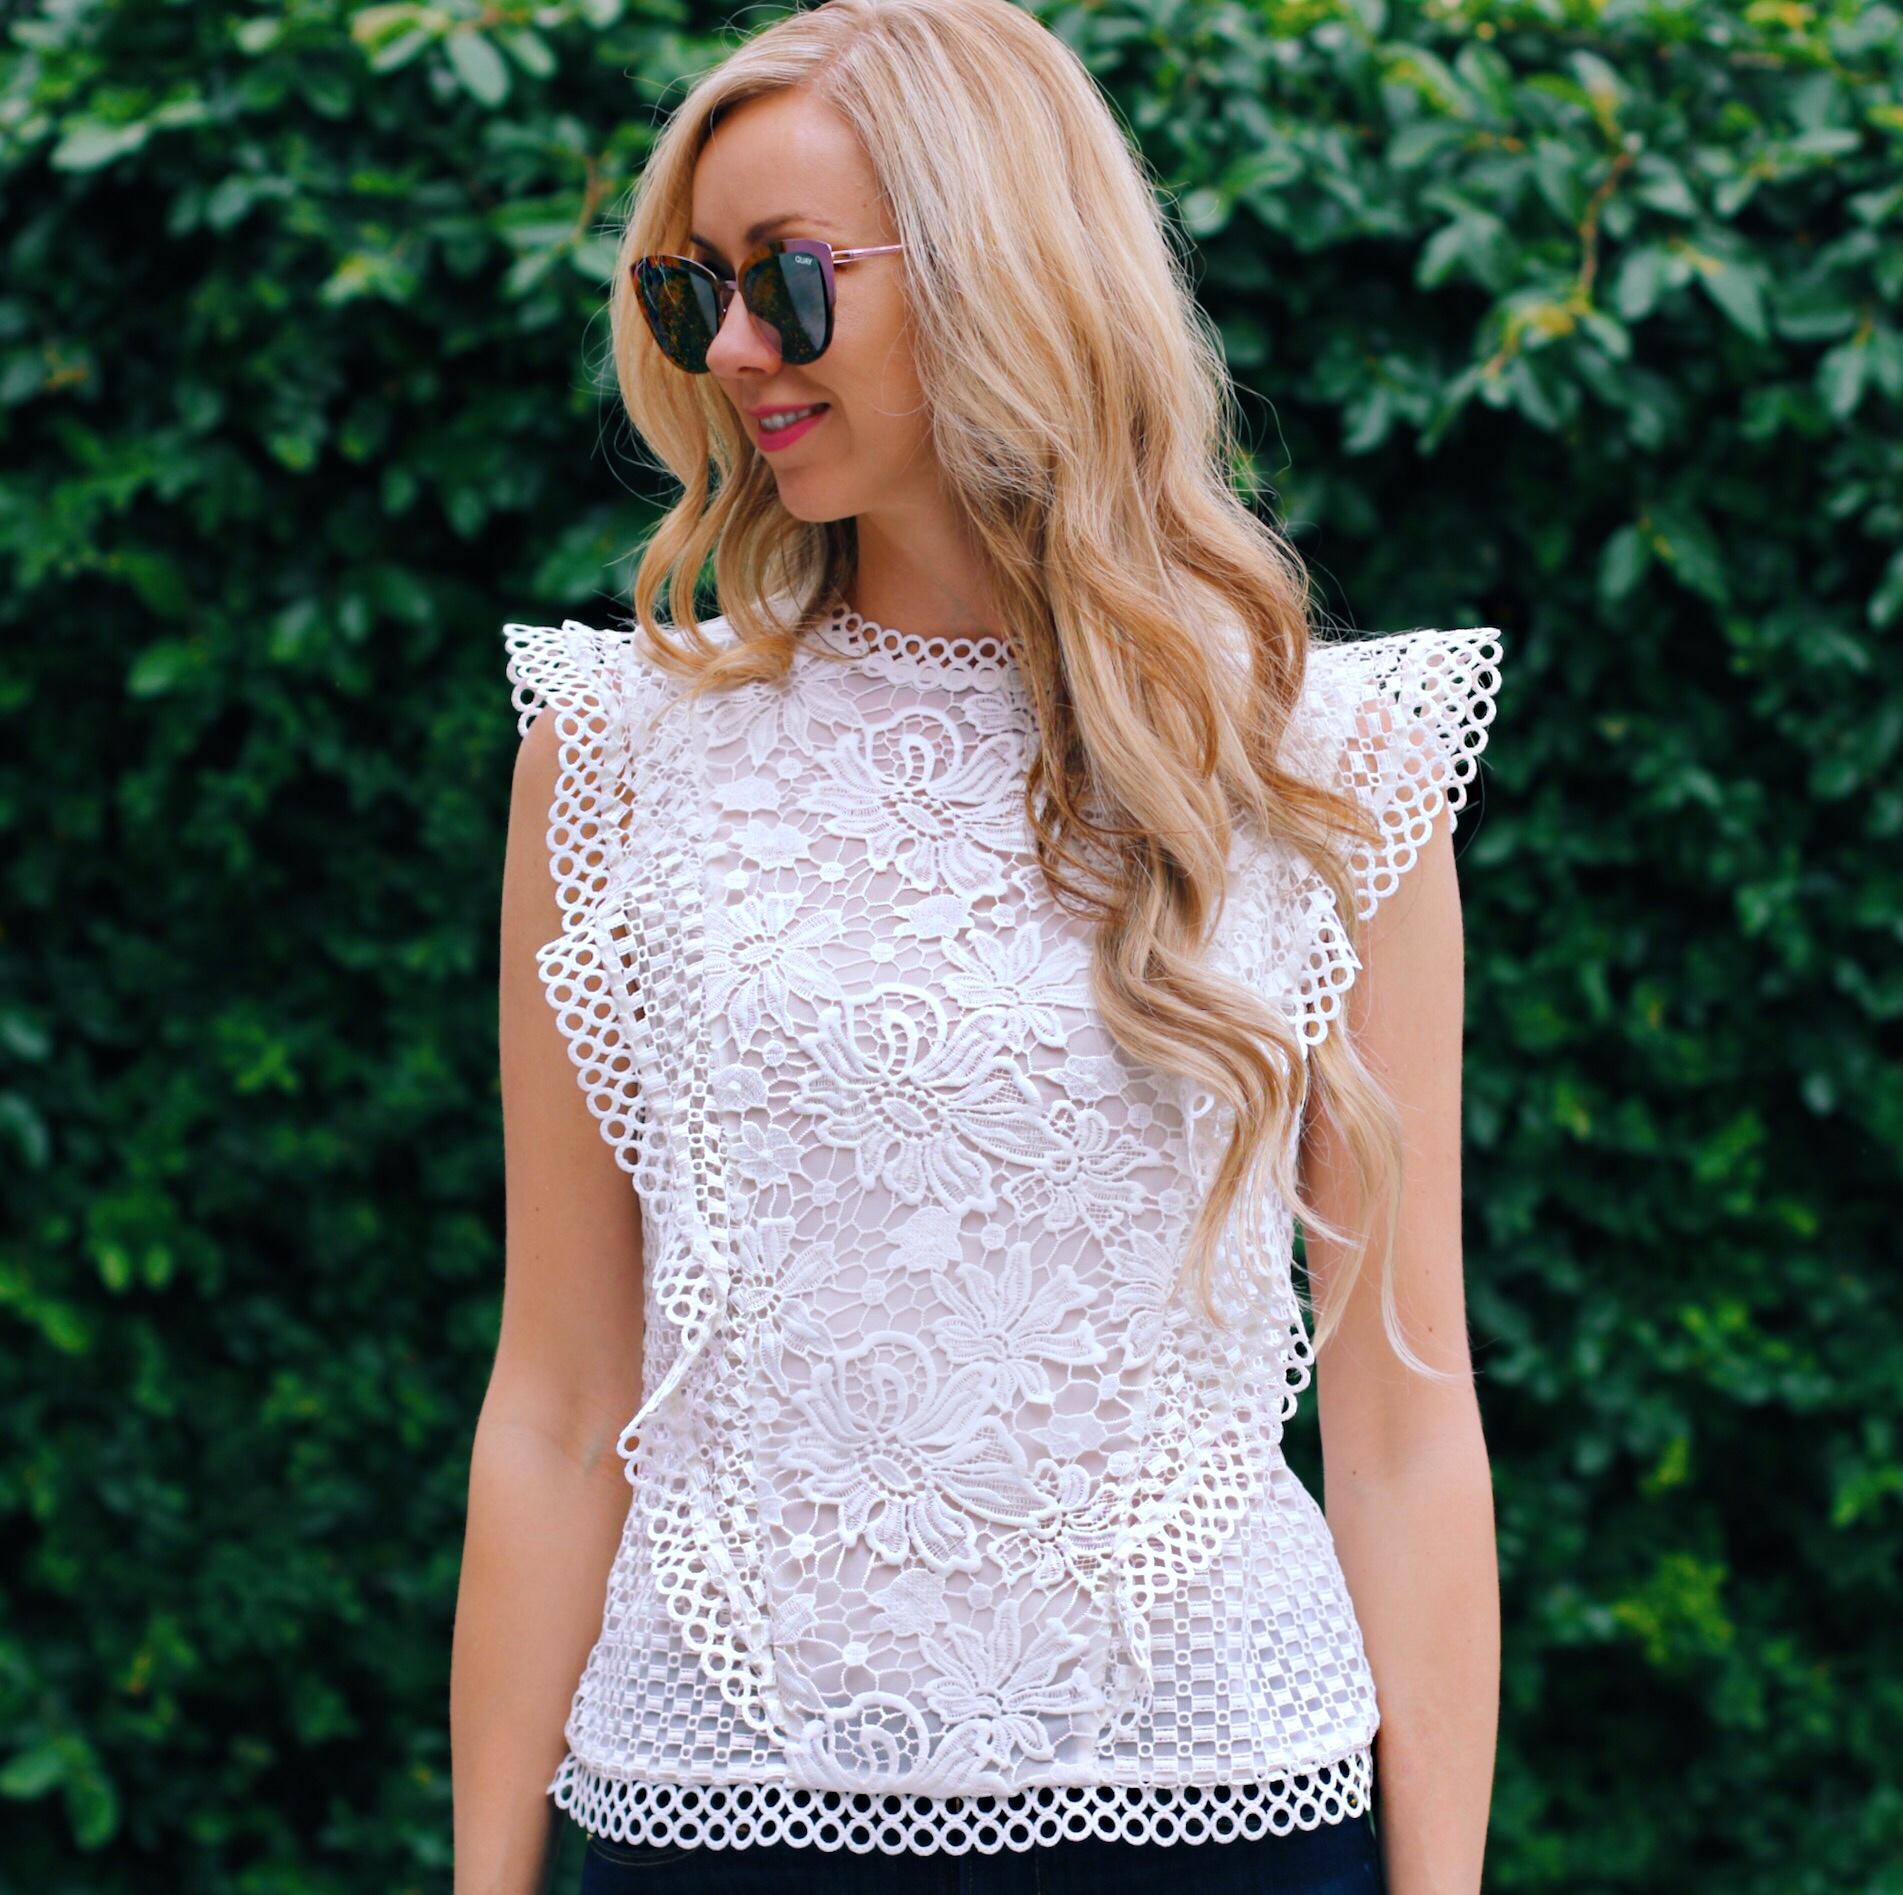 ted-baker-zania-top-white-lace-flutter-sleeve-3.jpg